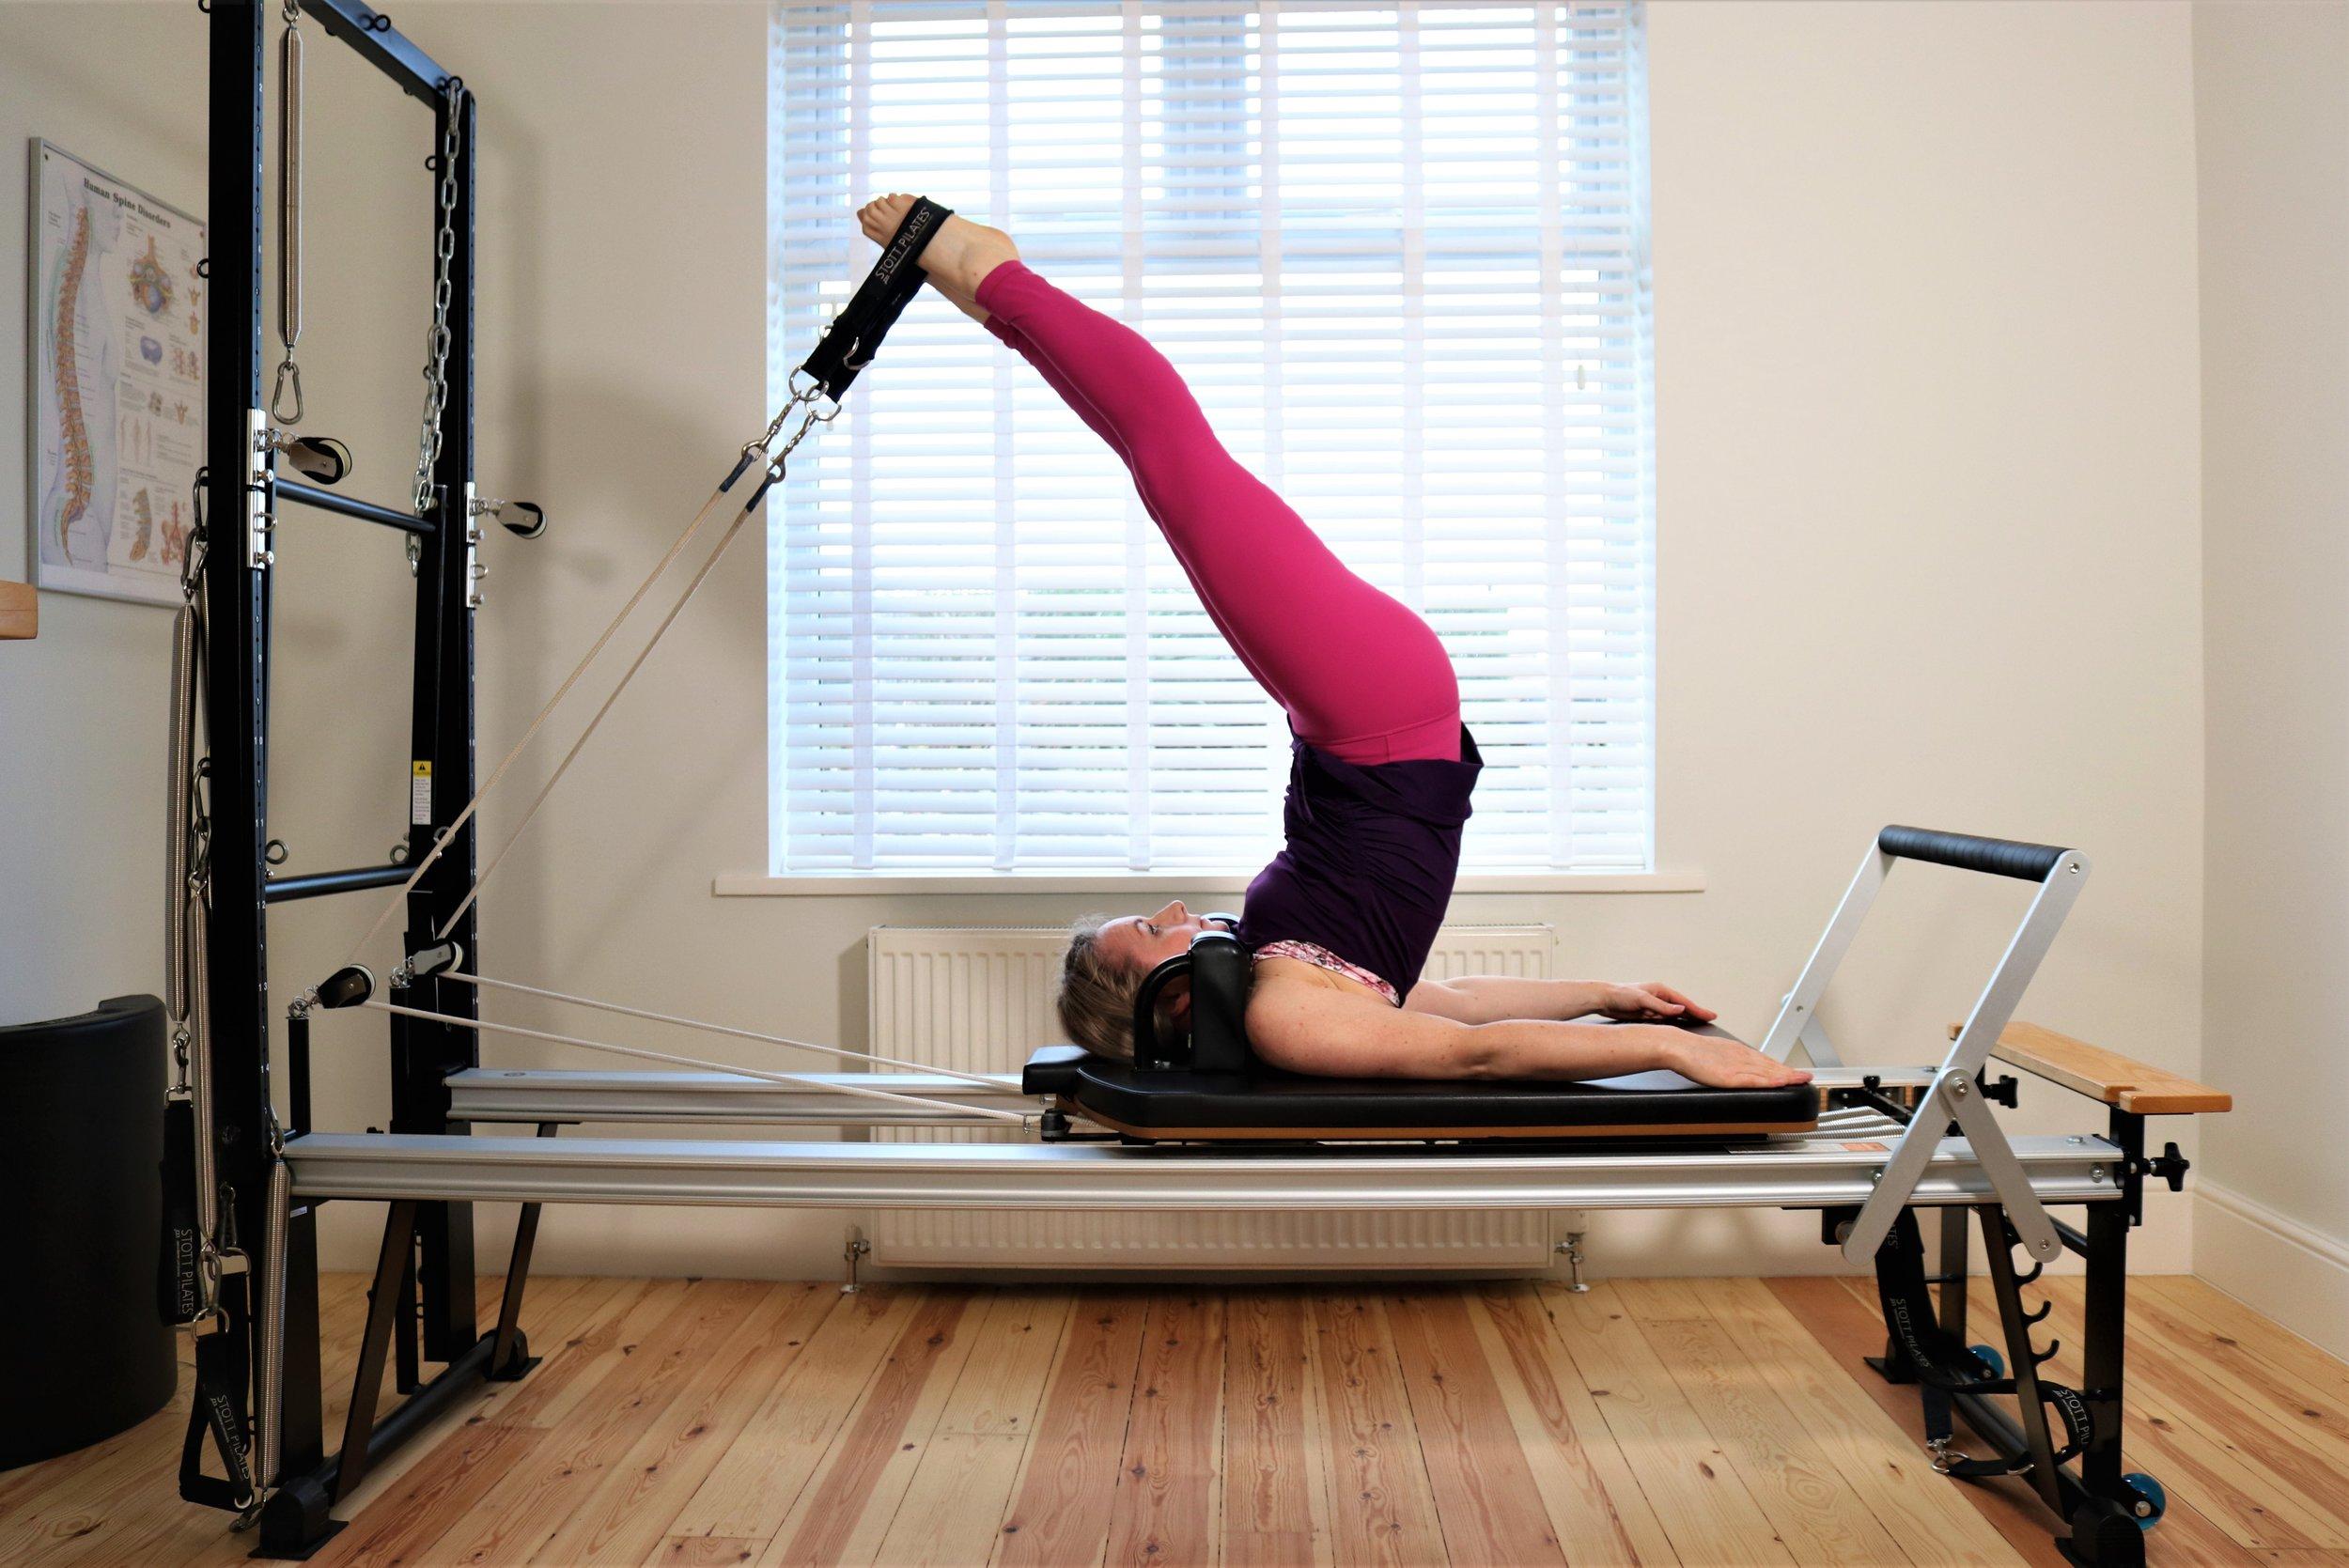 Pilates classes in Washington